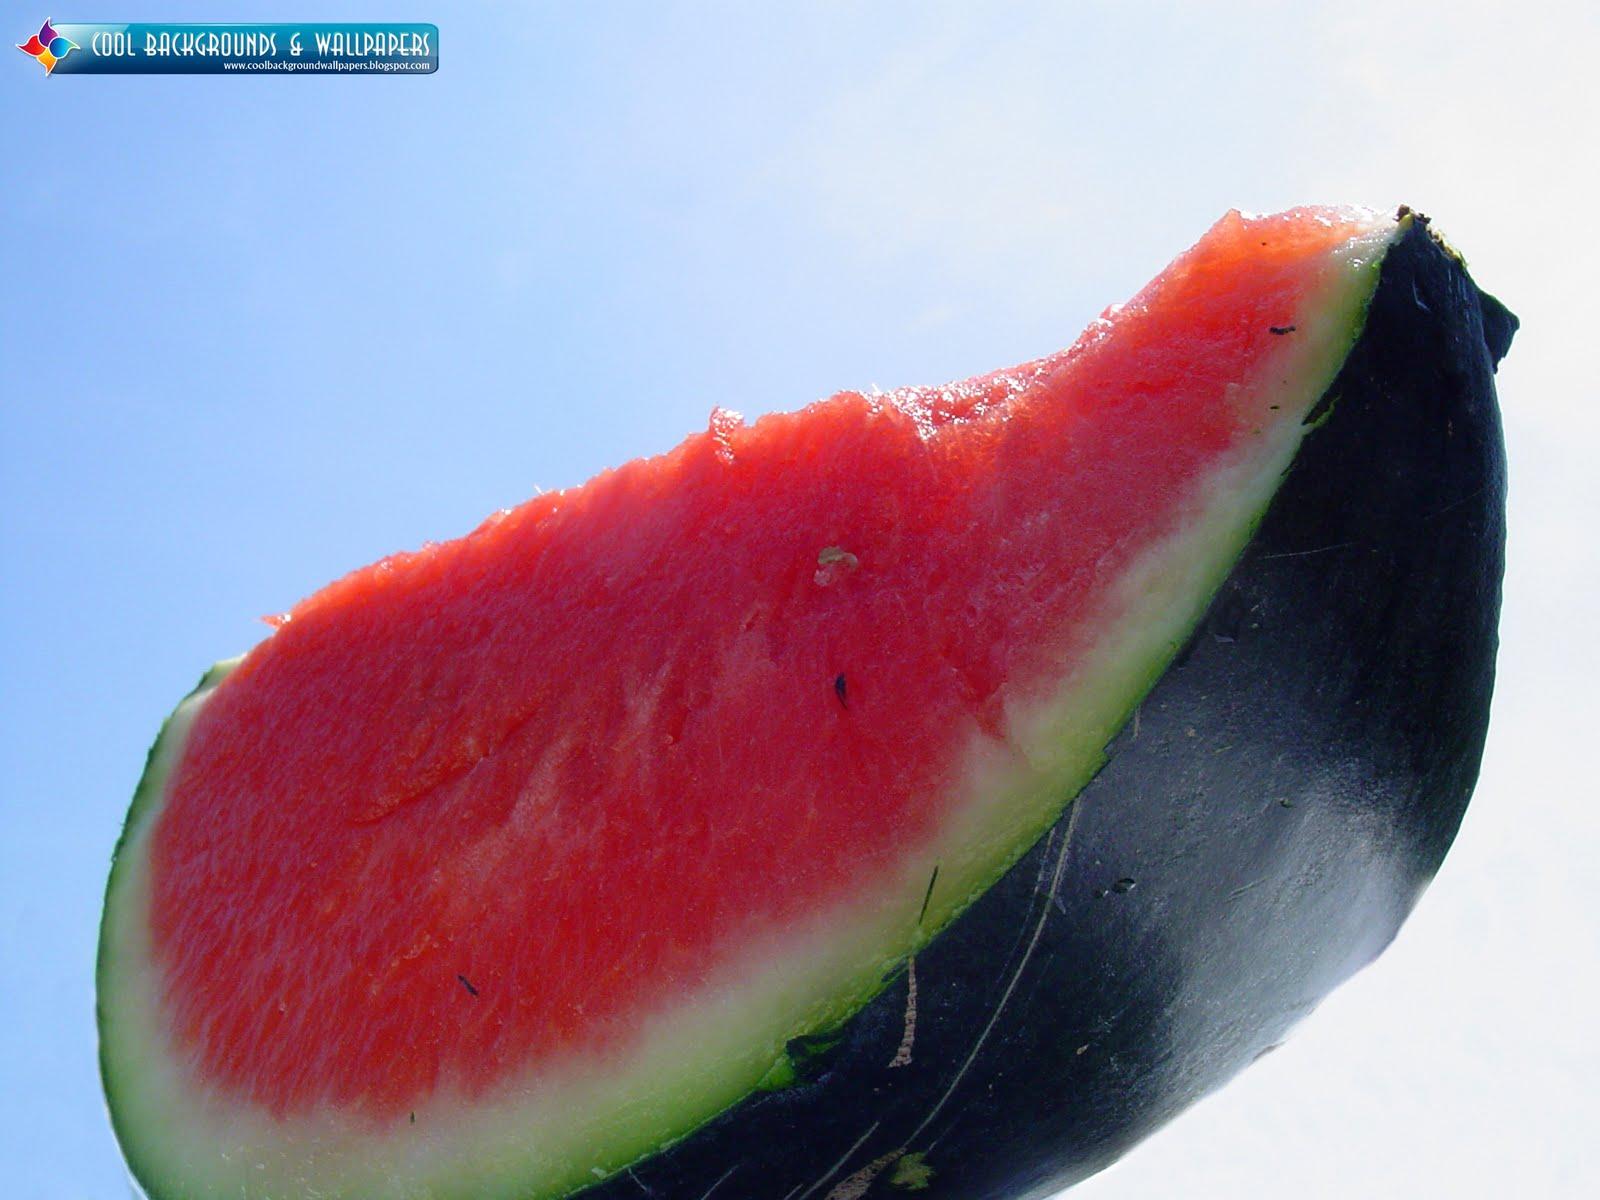 gallery for watermelon wallpaper hd